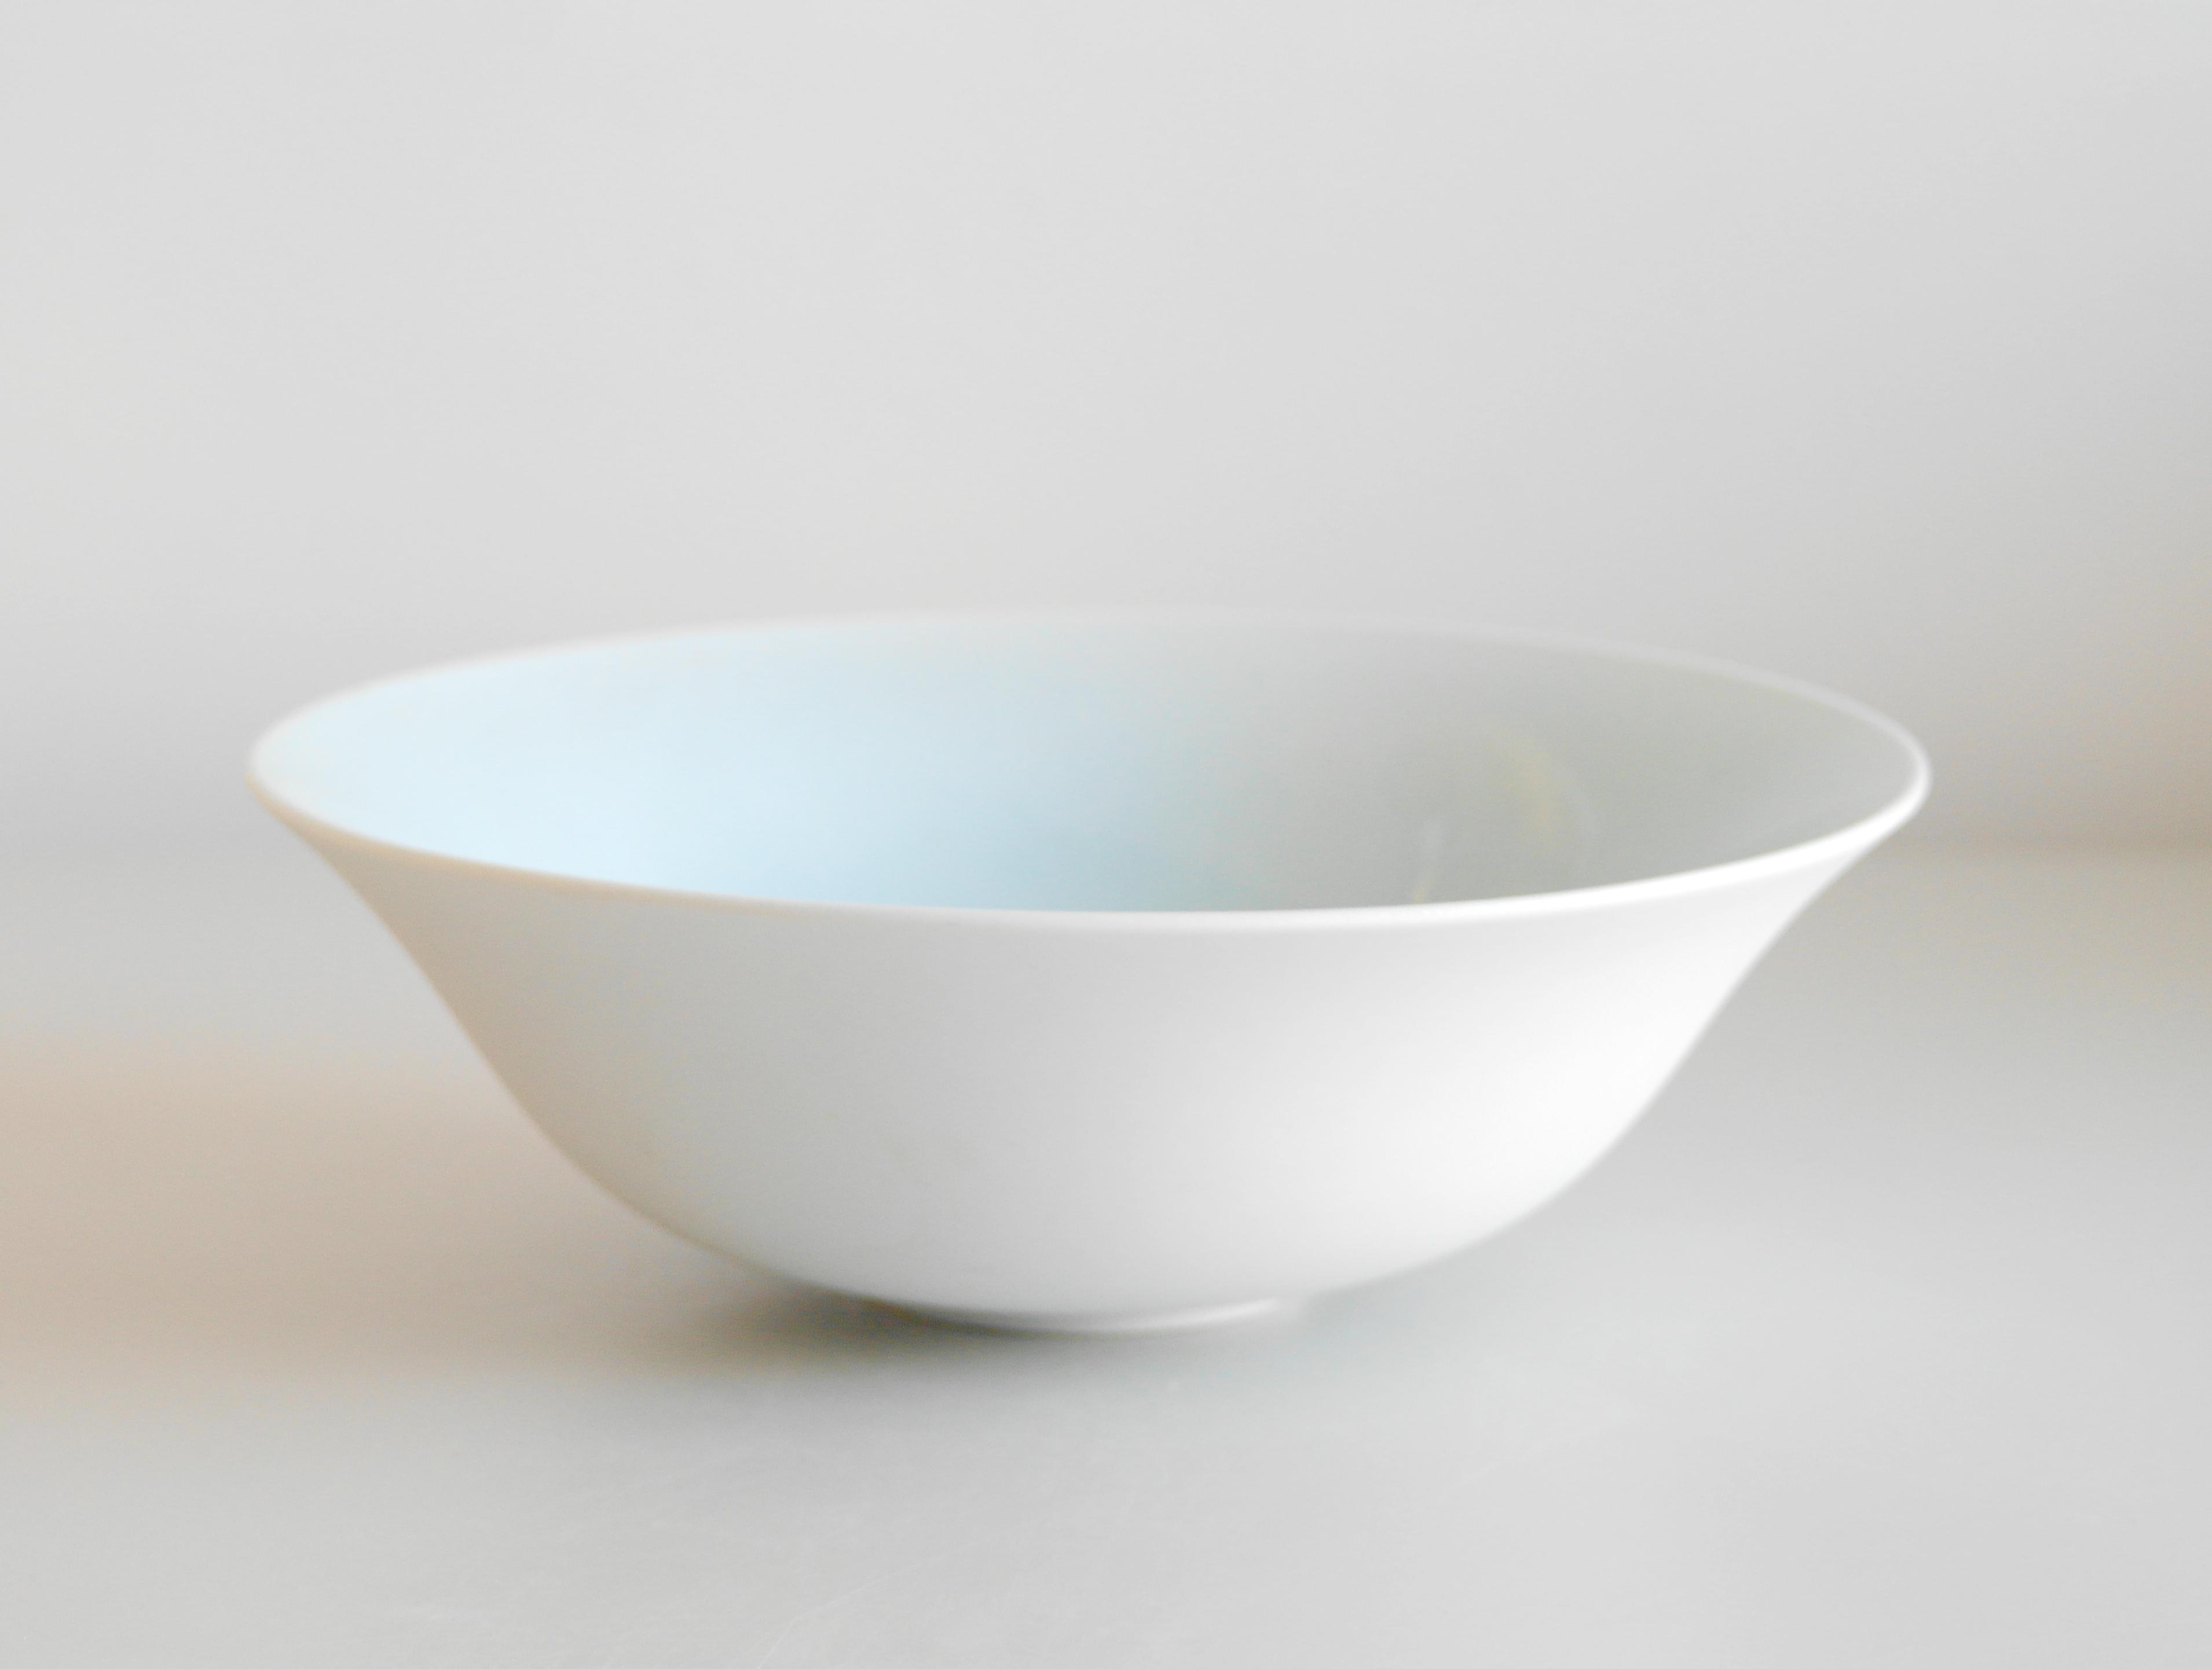 cds-bowl-l-lightblue